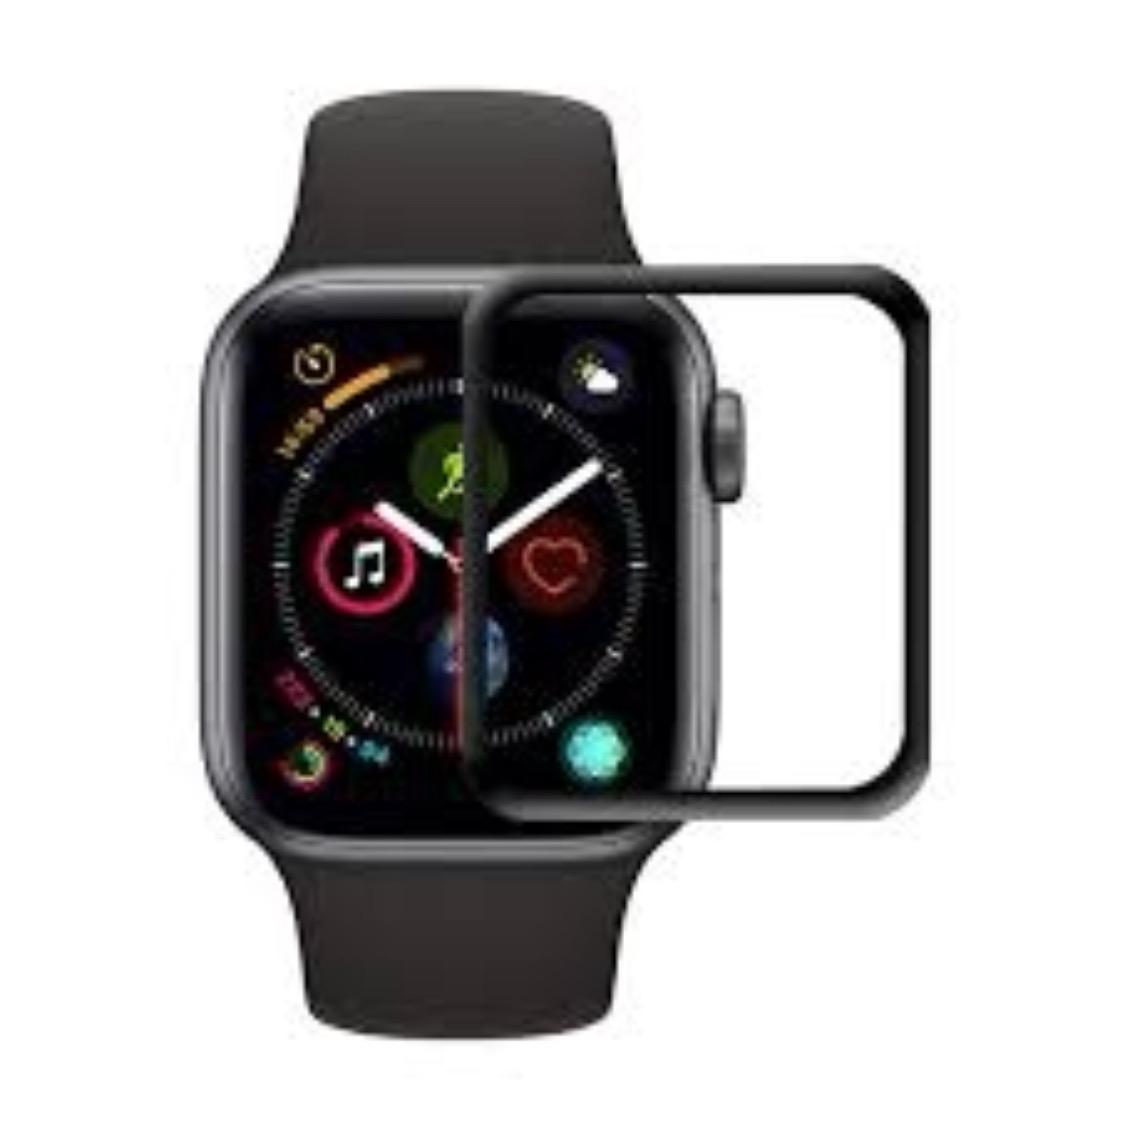 Smartwatch tempered